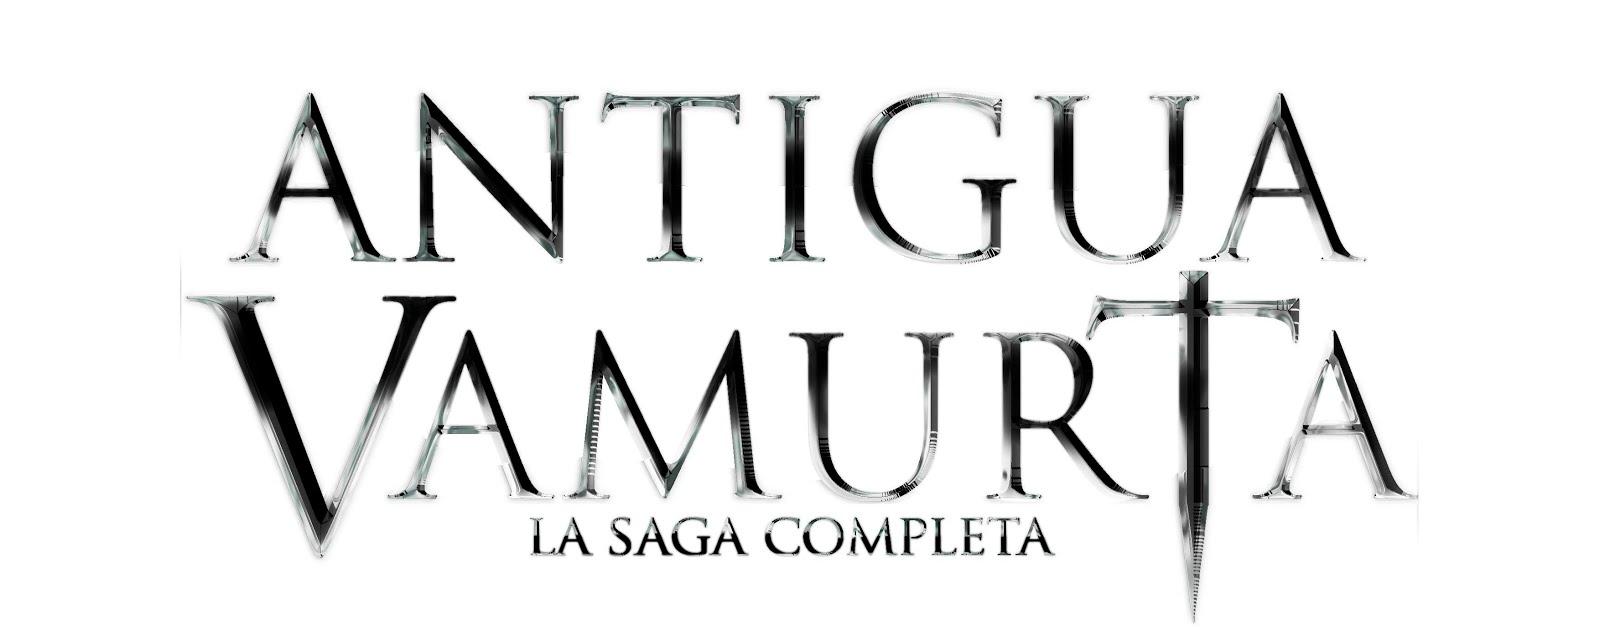 Antigua Vamurta: De libros de fantasía épica, Vamurta